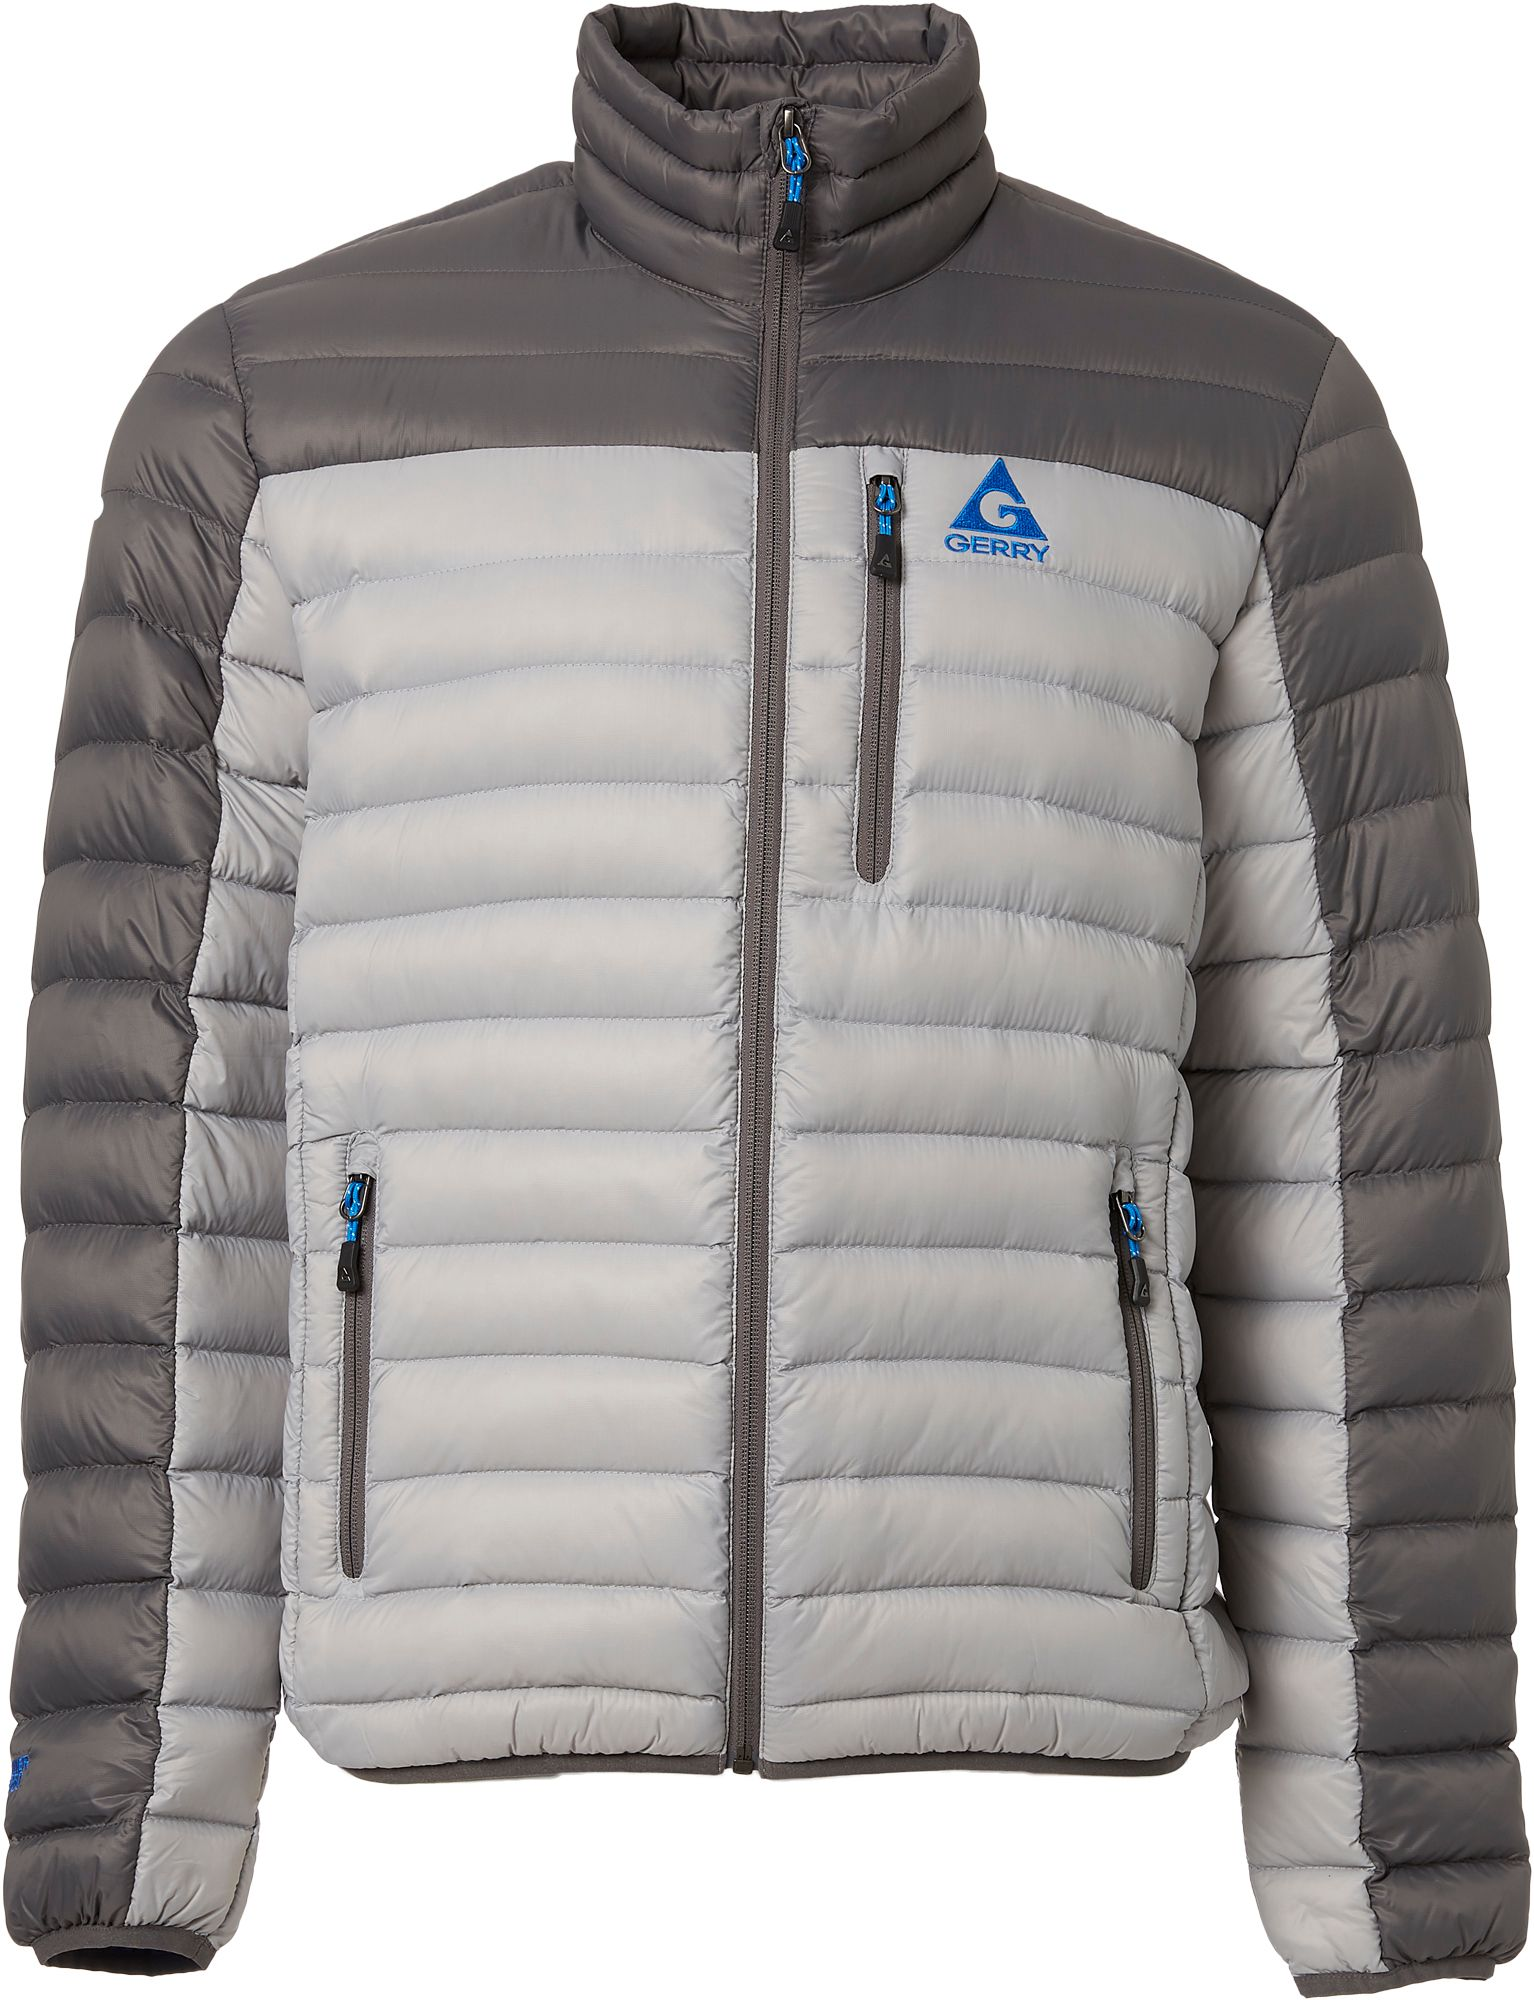 Gerry Men's Replay Packable Down Jacket | DICK'S Sporting Goods